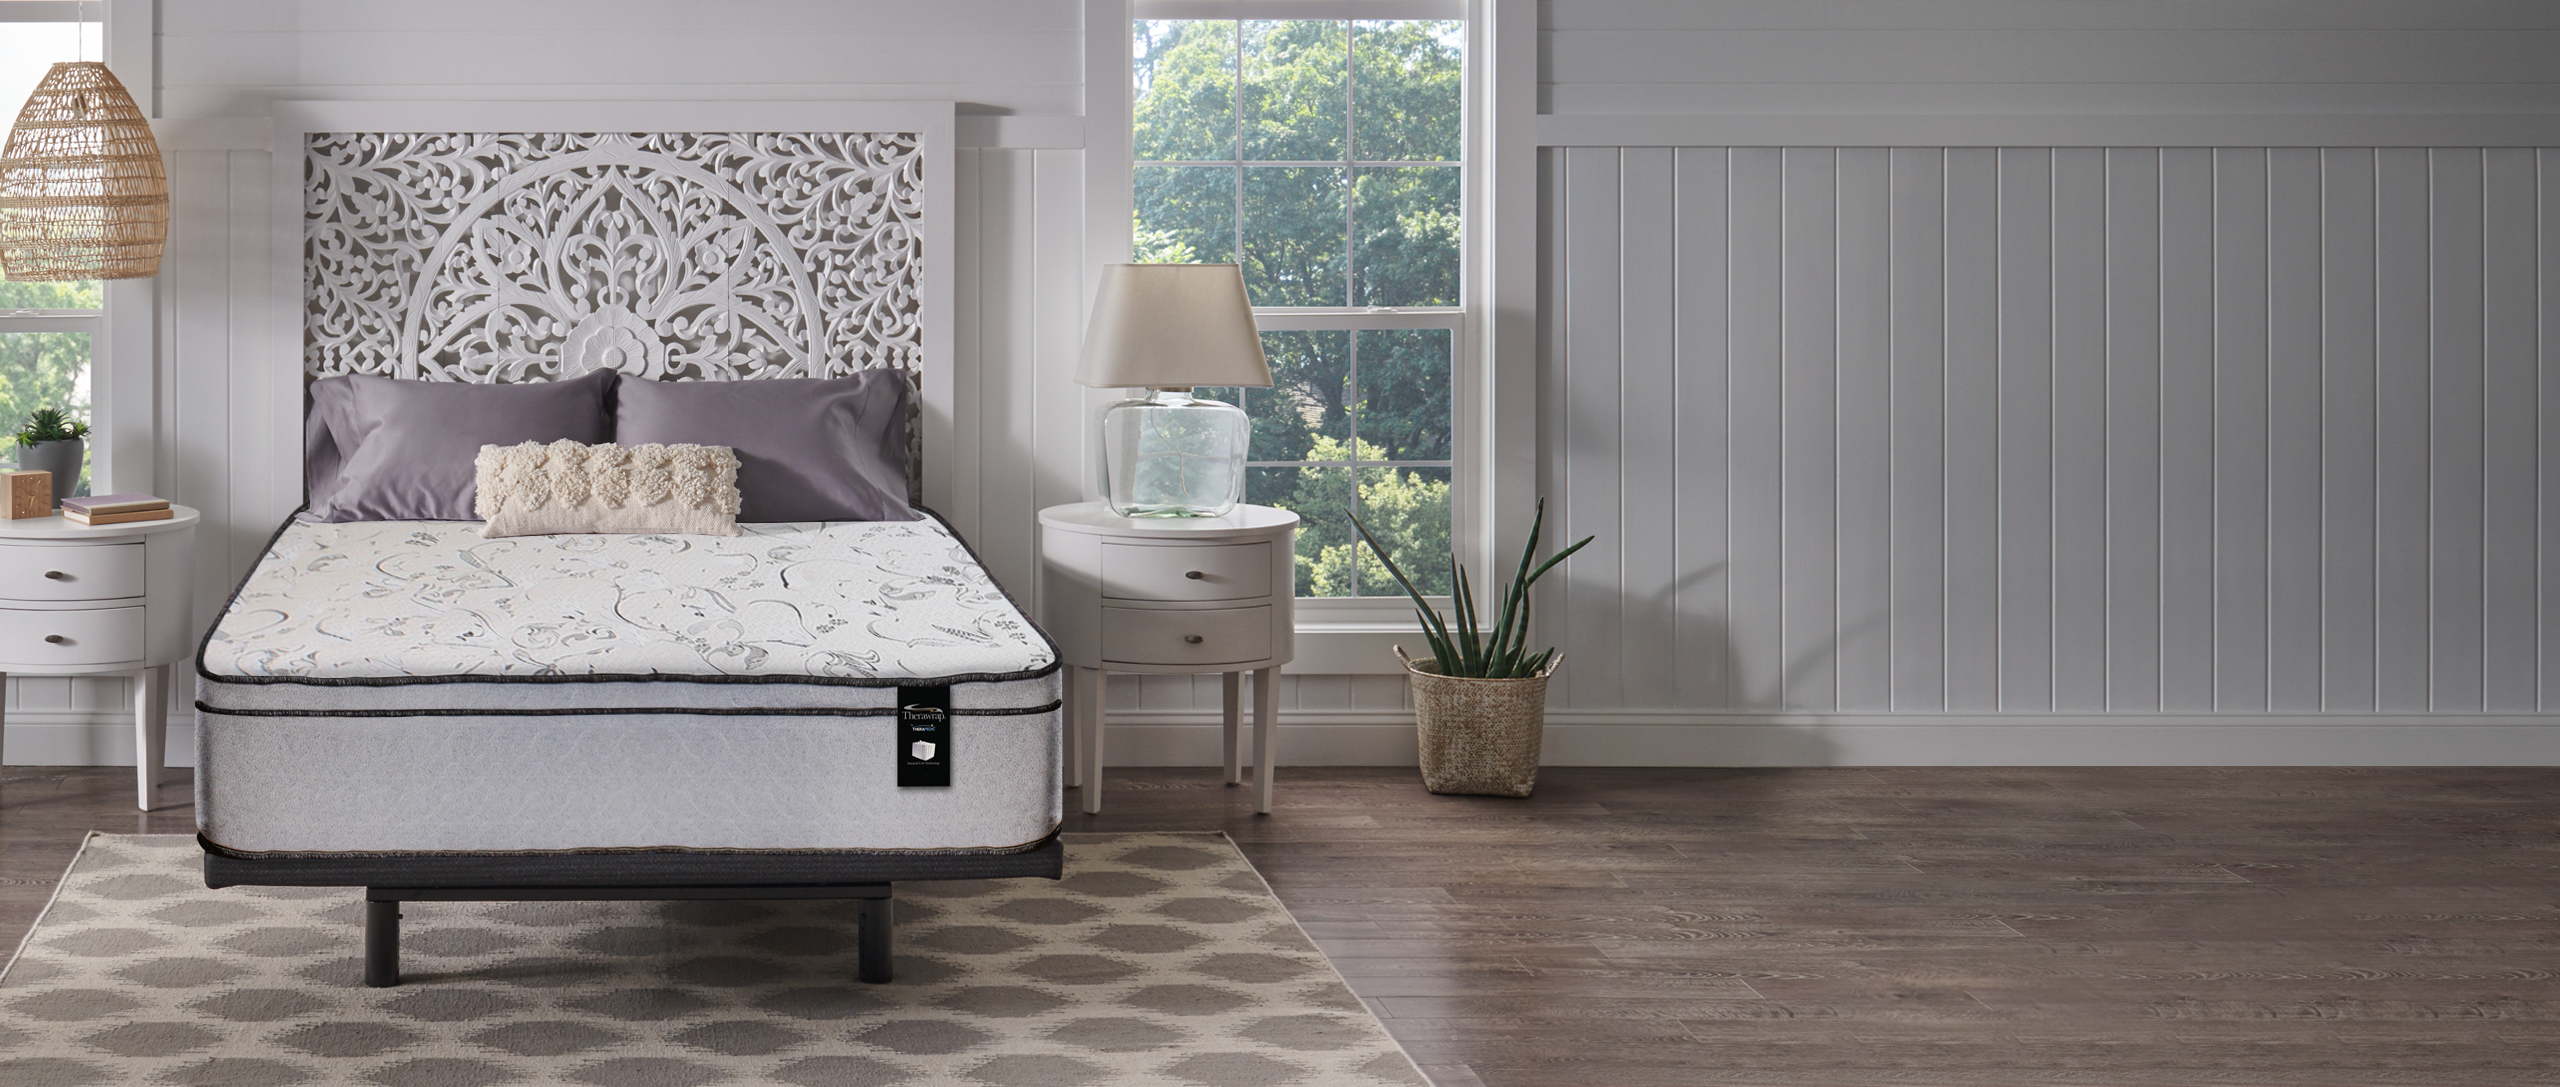 Therawrap Mattress in a bedroom setting